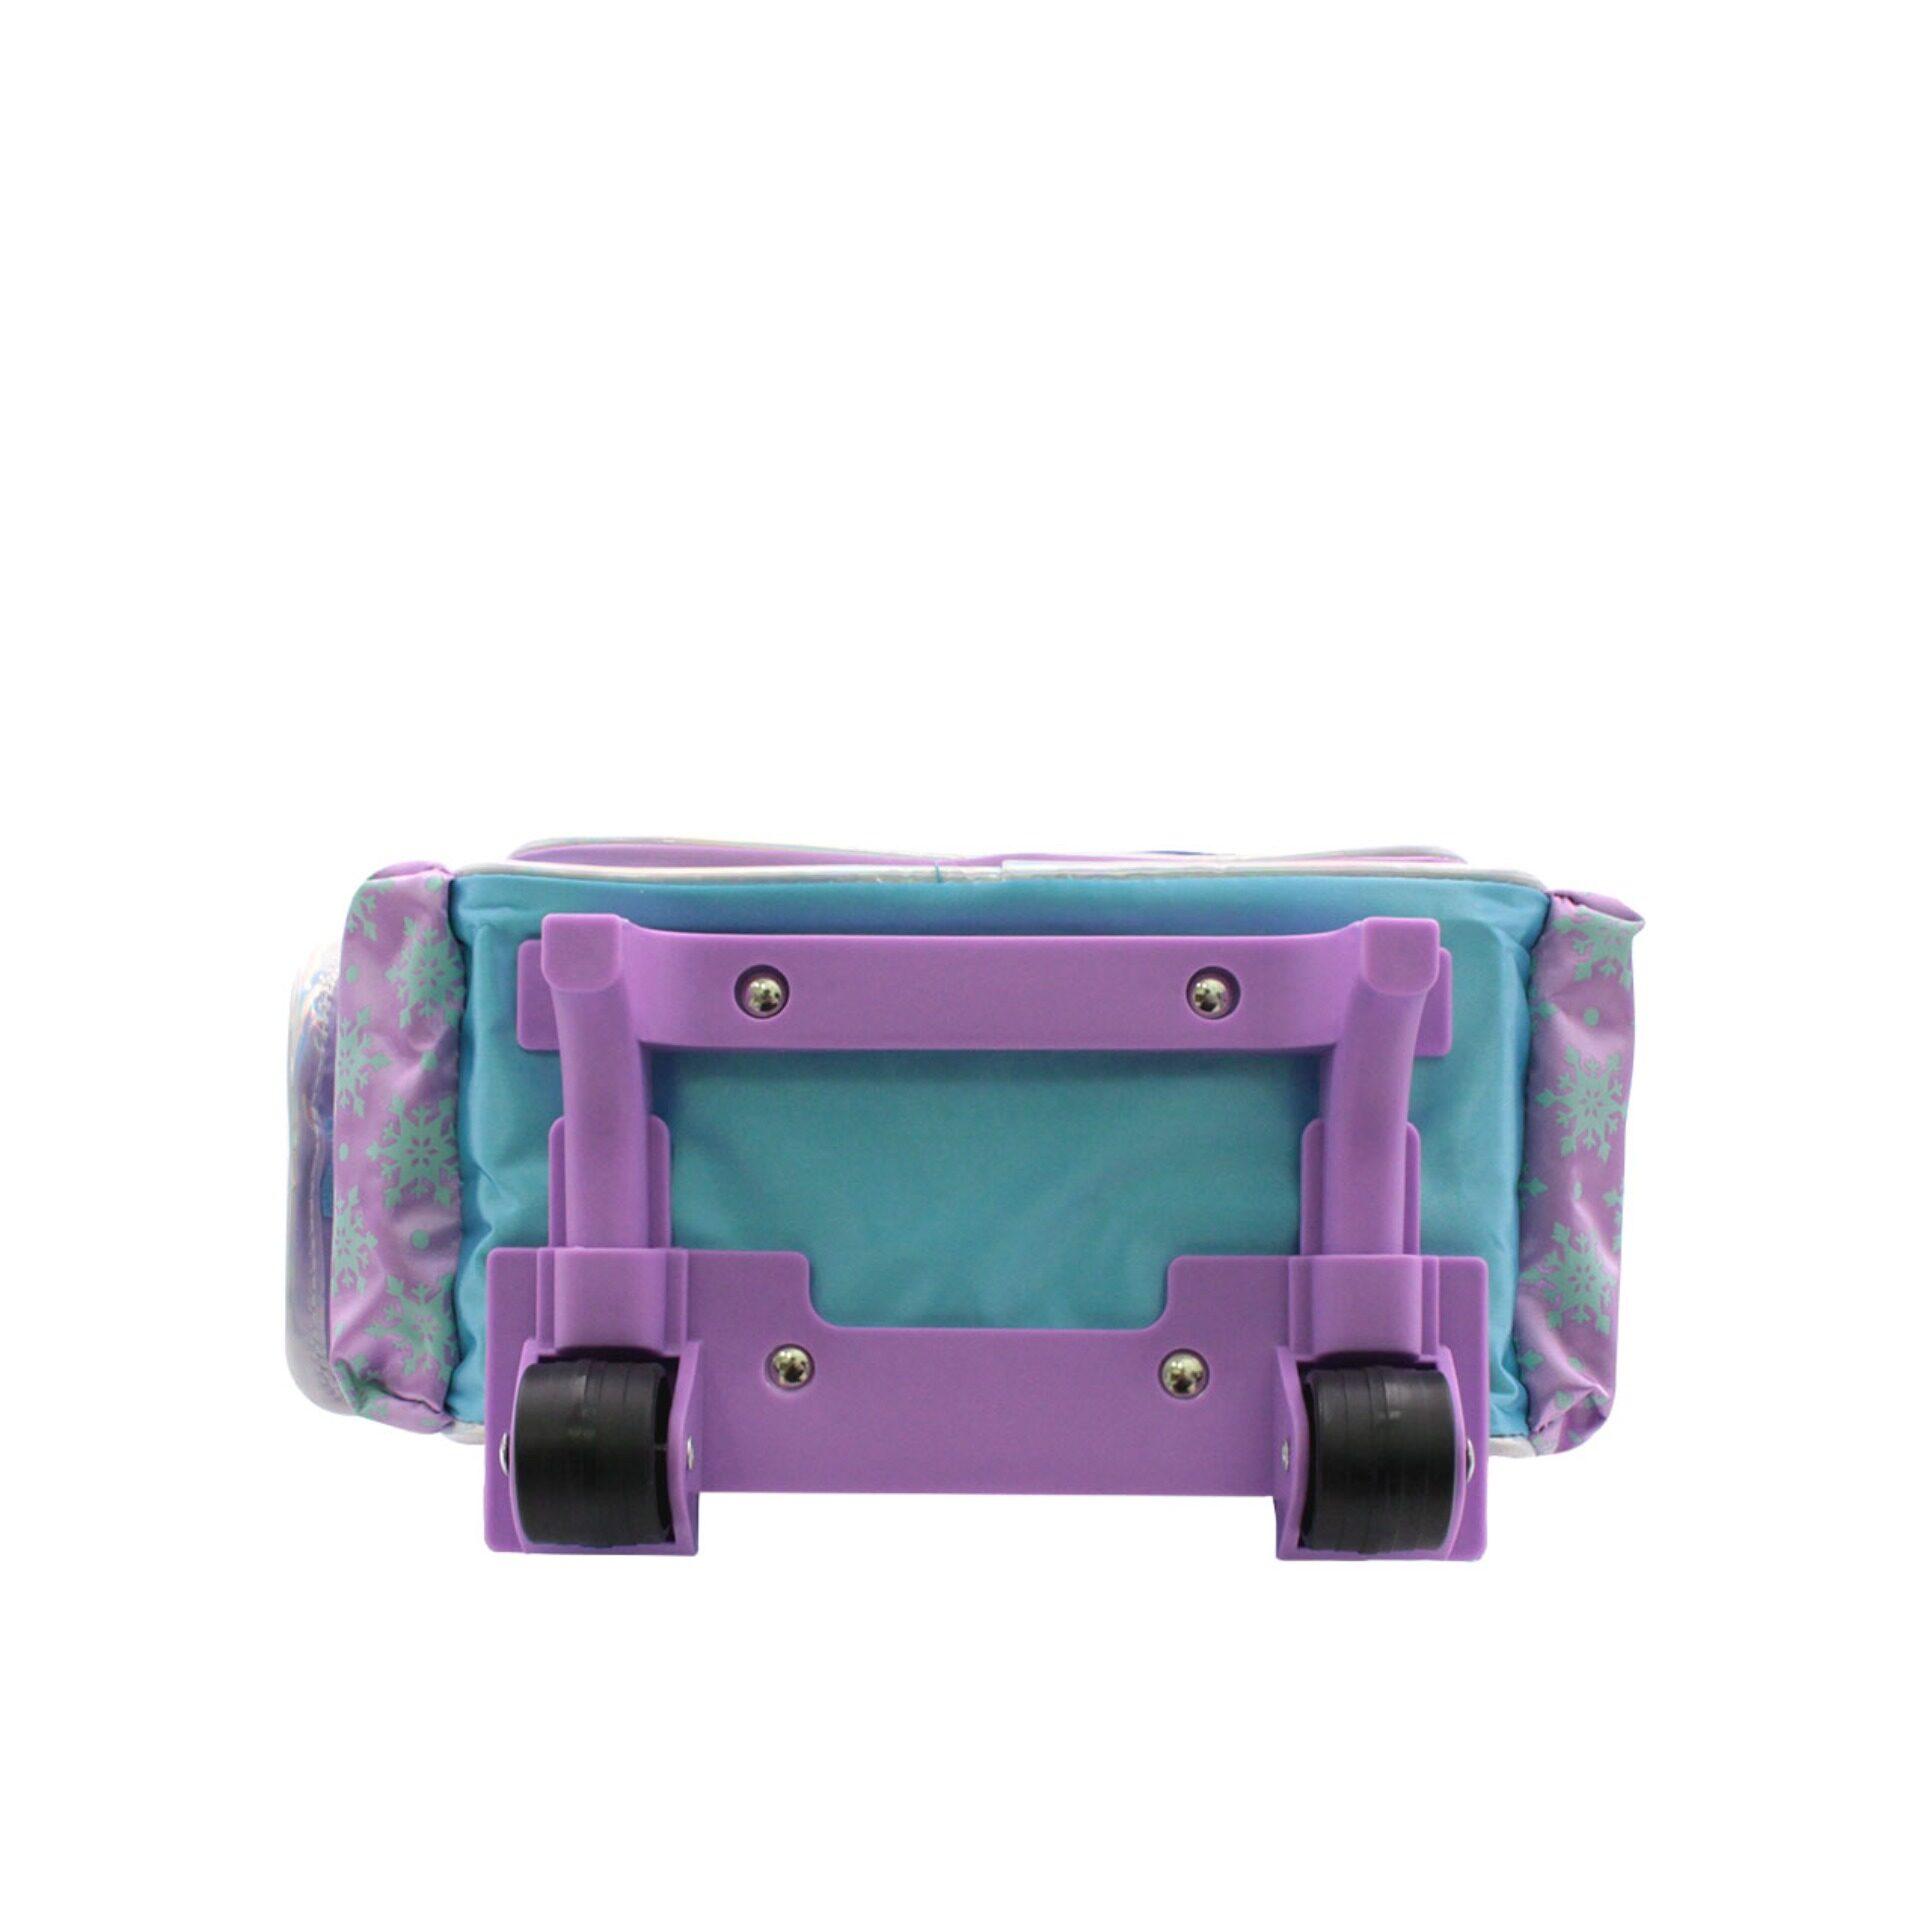 Disney Frozen 2 Princess Elsa Anna & Olaf Pre School Trolley Bag with 2 Wheels (Light Purple & Blue) (Age 7 Years & Above)